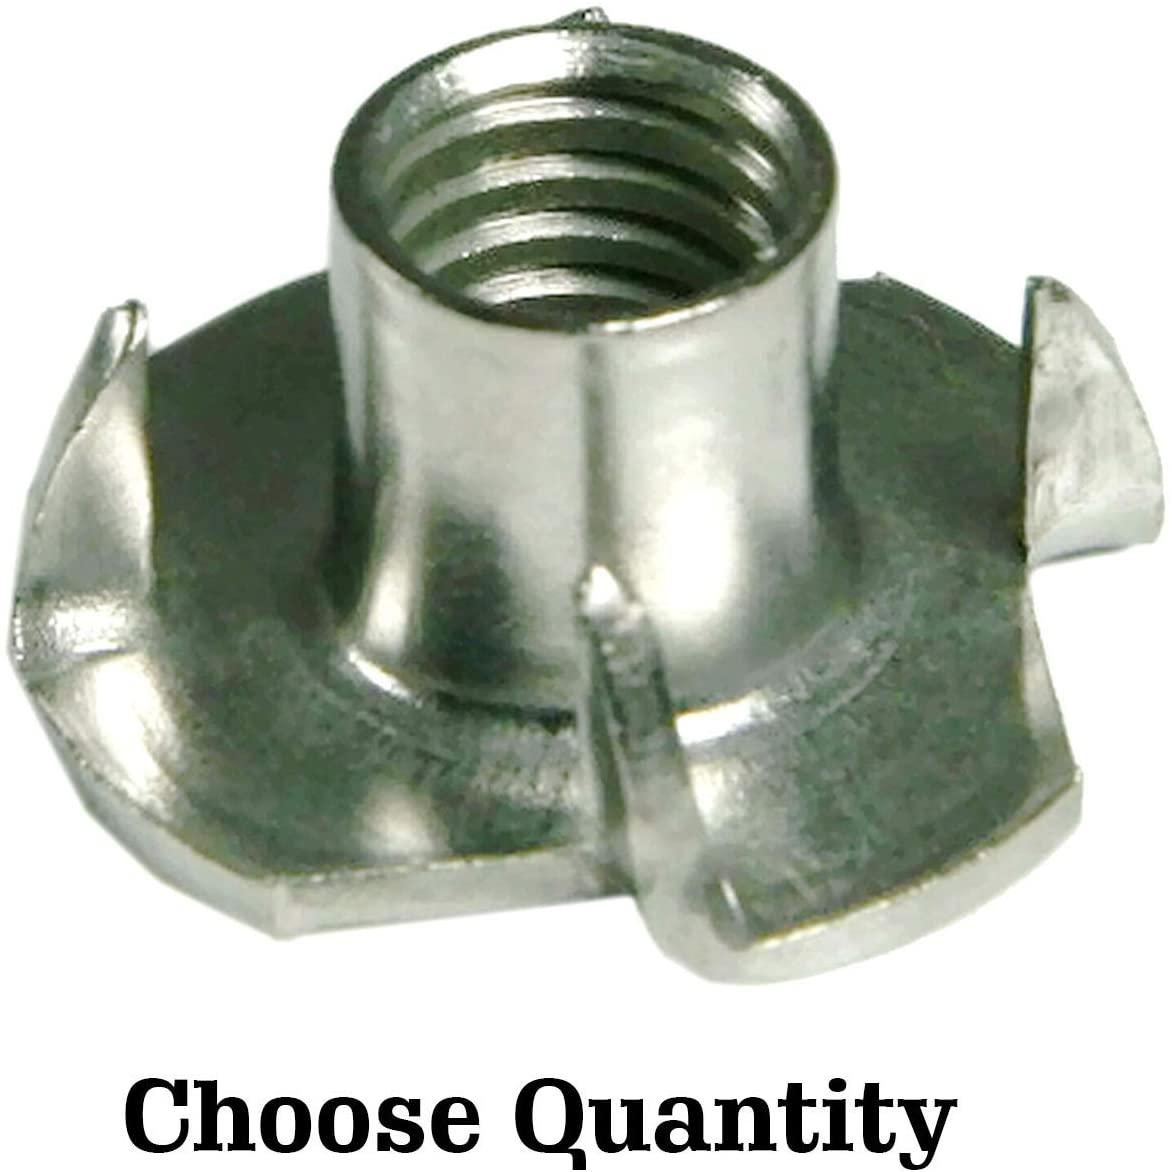 4 Prong Tee Nuts T Nut Insert - Steel Tee Nuts 1/4-20 x 3/8 - Four Prong T Nut Inserts - 4 Pronged Tee Nut T Nuts 1/4-20 T Slot Nut Steel T-Nut Blind Nuts 1/4-20 (12)